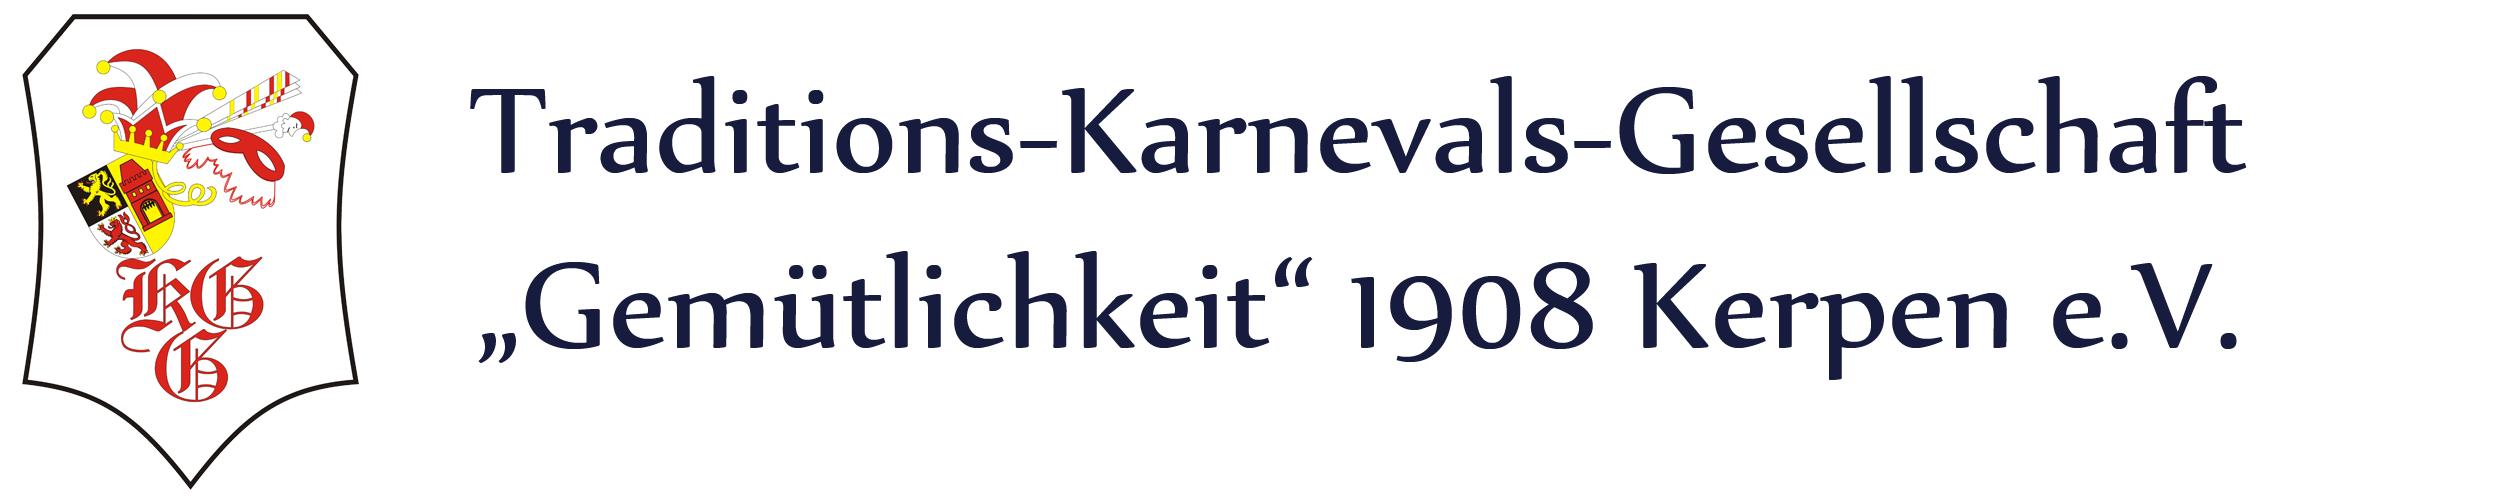 Traditions-Karnevals-Gesellschaft Gemütlichkeit 1908 Kerpen e.V.